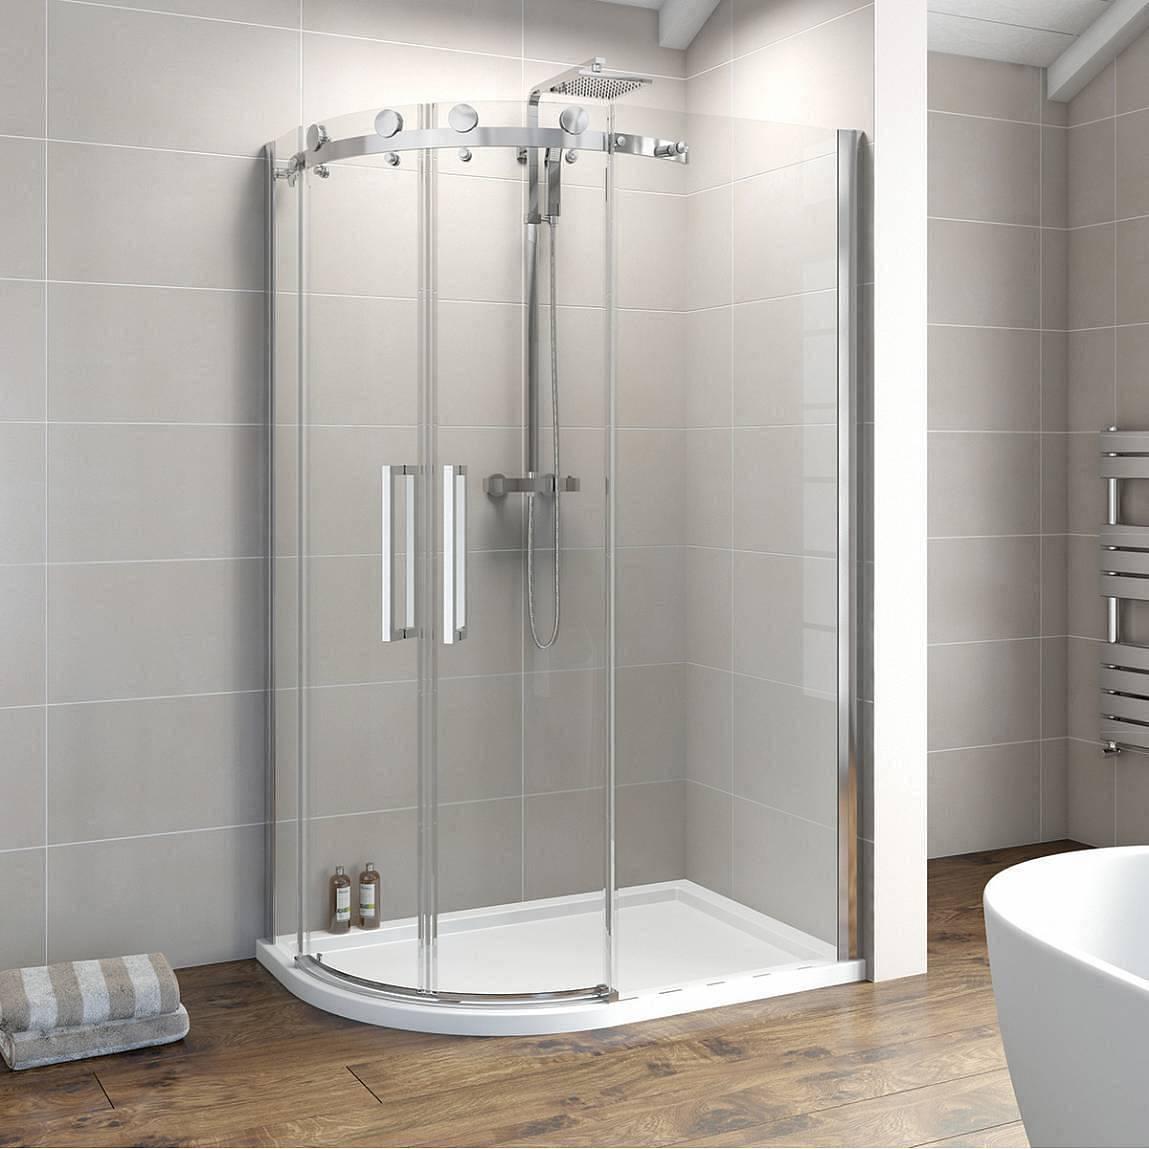 Image of V8+ Frameless Offset Quadrant Shower Enclosure 1200 x 900